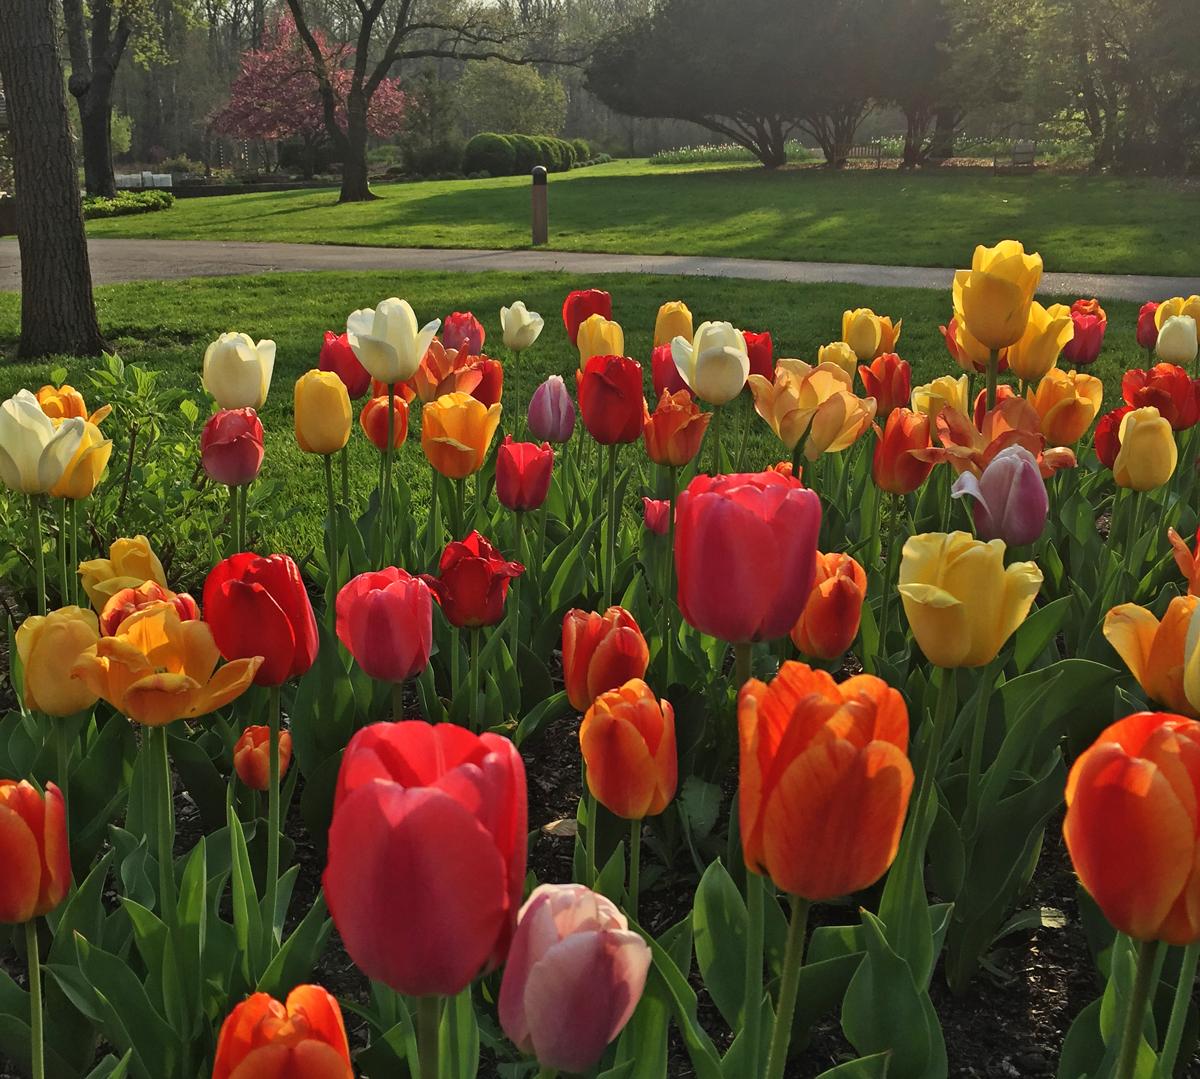 Tulips in bloom at Inniswood Metro Gardens